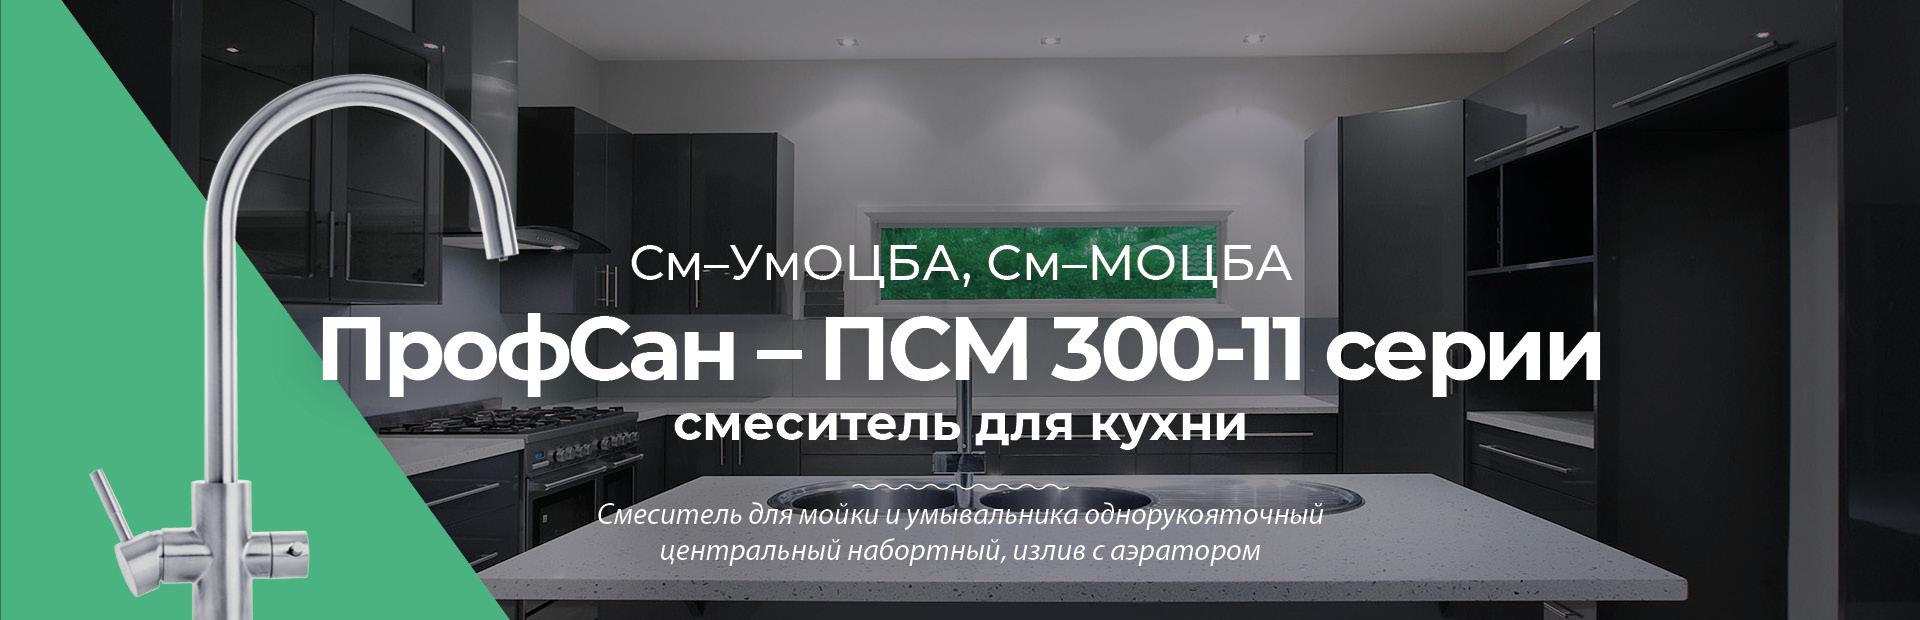 Баннер со смесителем Профсан ПСМ 300-11